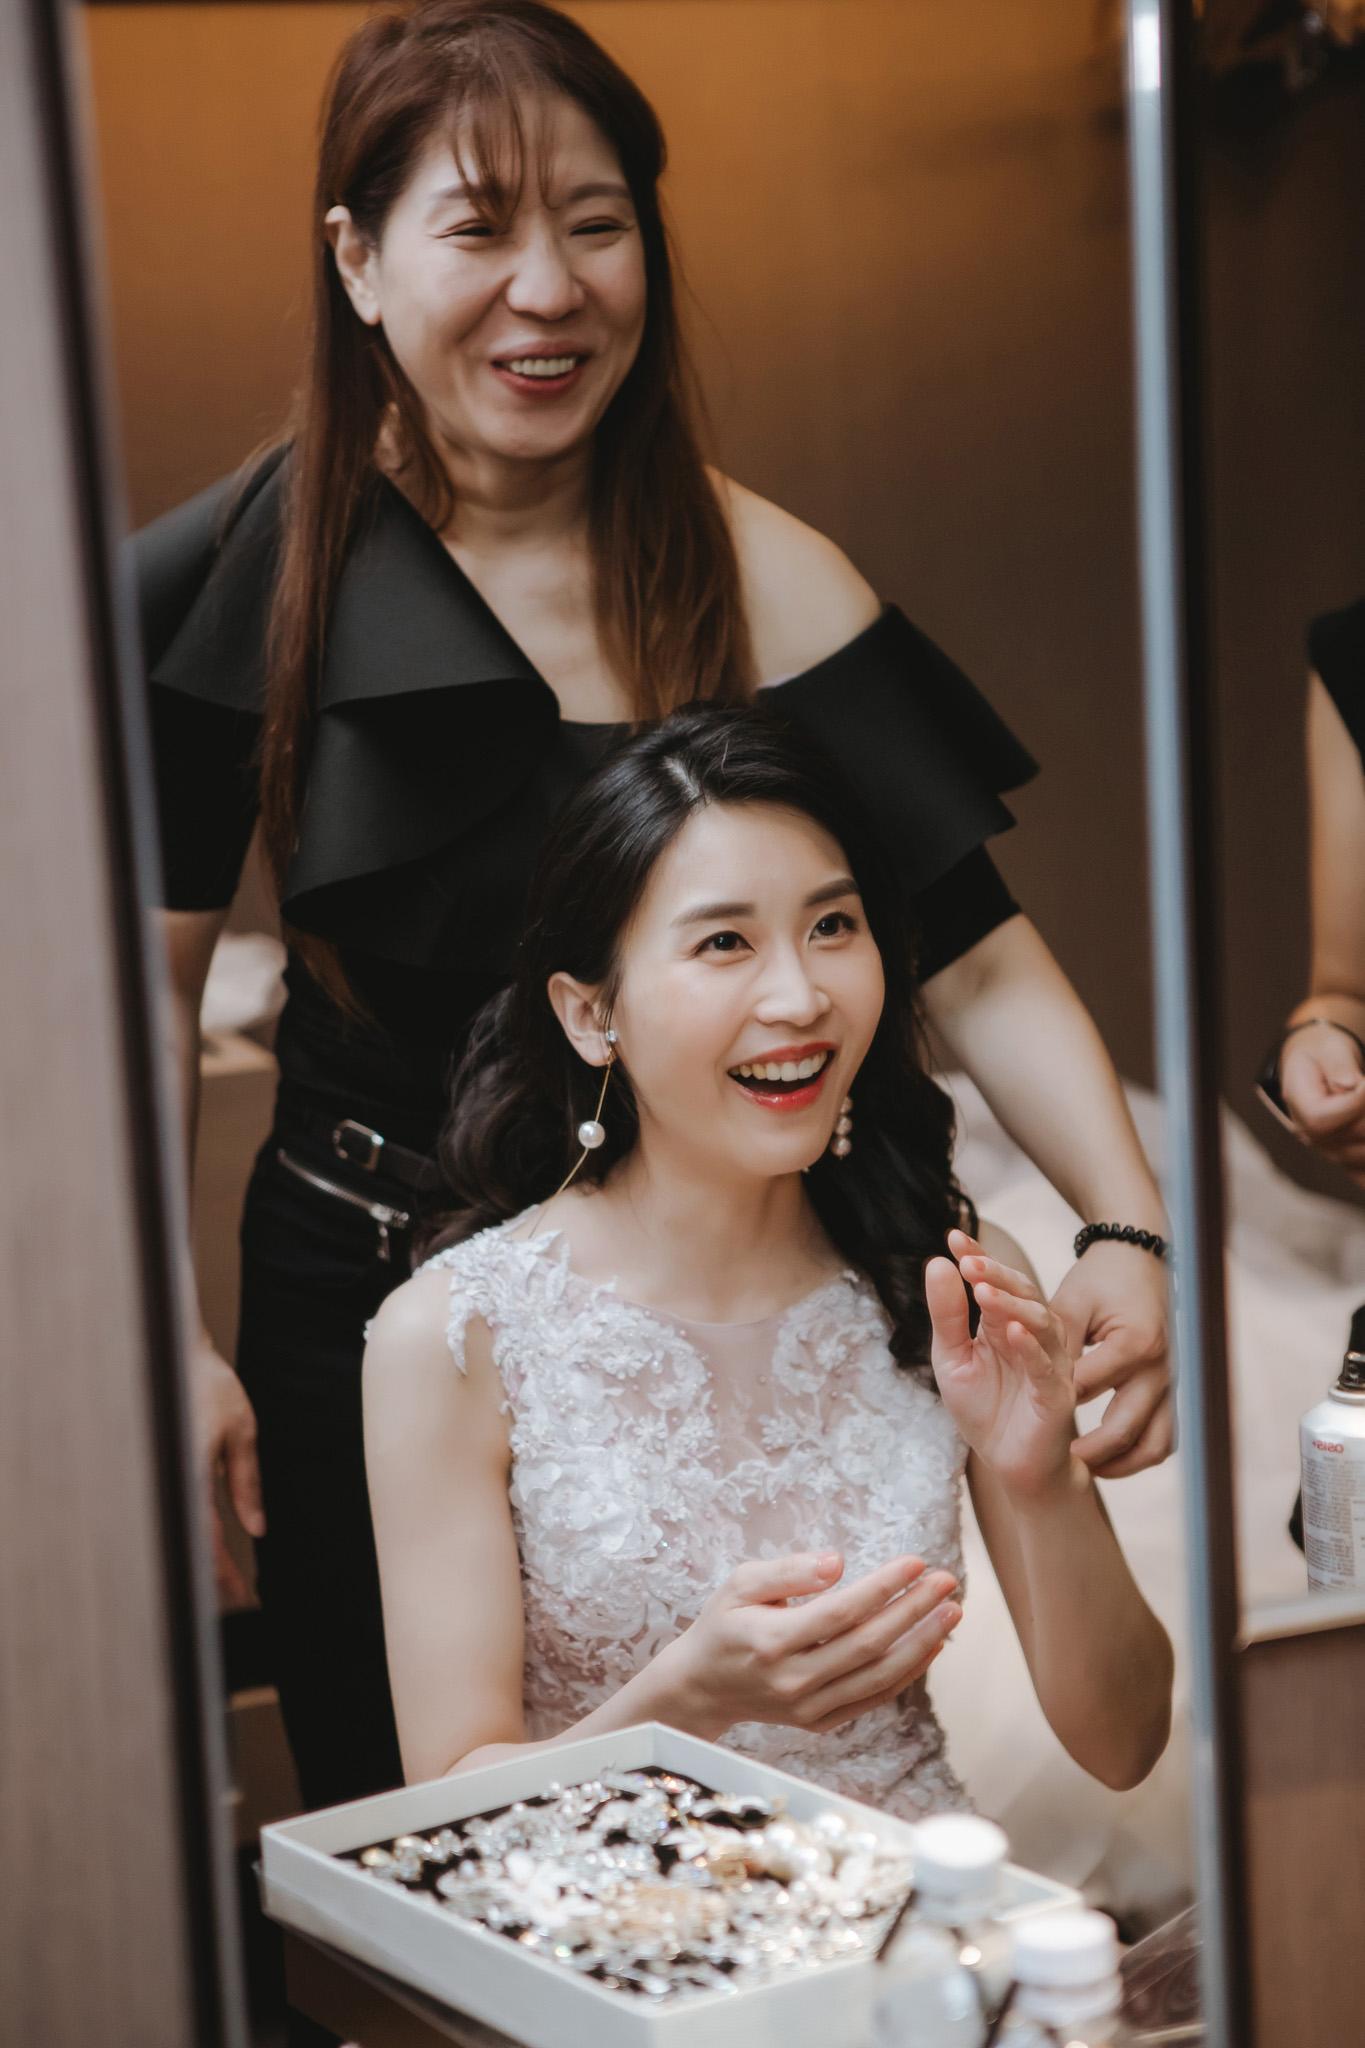 EW 居米 台北禮服 台北婚紗 台北婚攝 國泰萬怡 台北婚禮-28